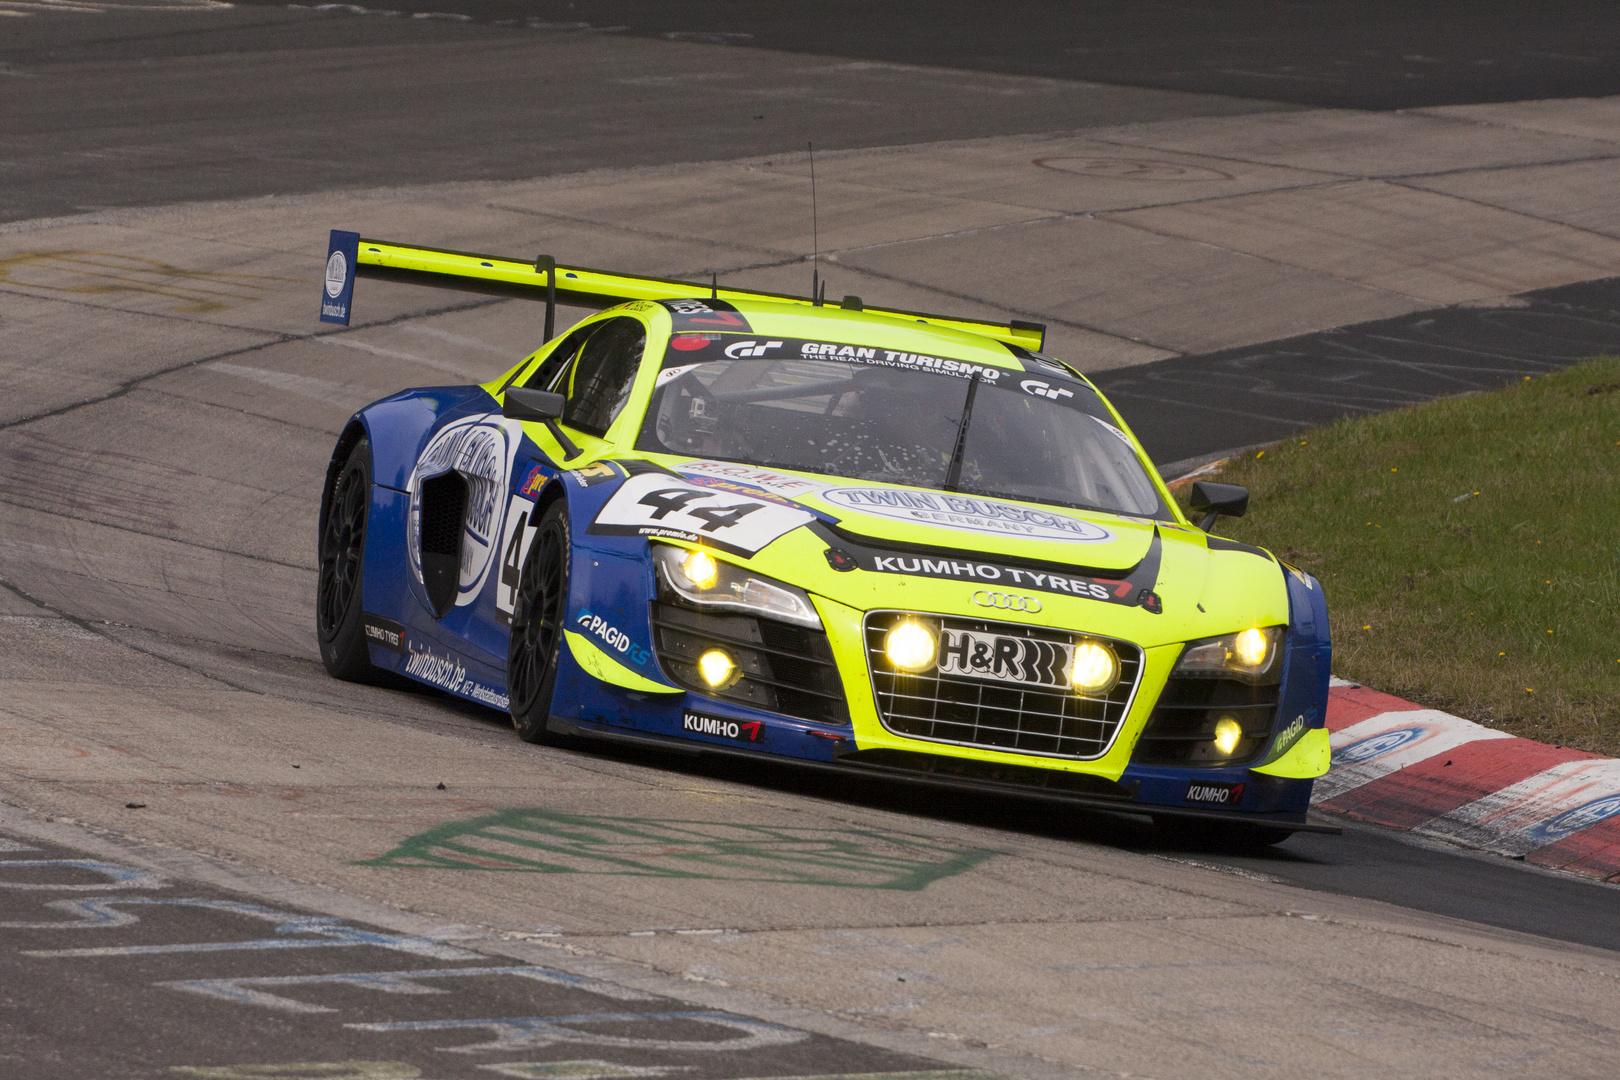 Nürburgring VLN 28.09.2013 - Audi R8 LMS ultra